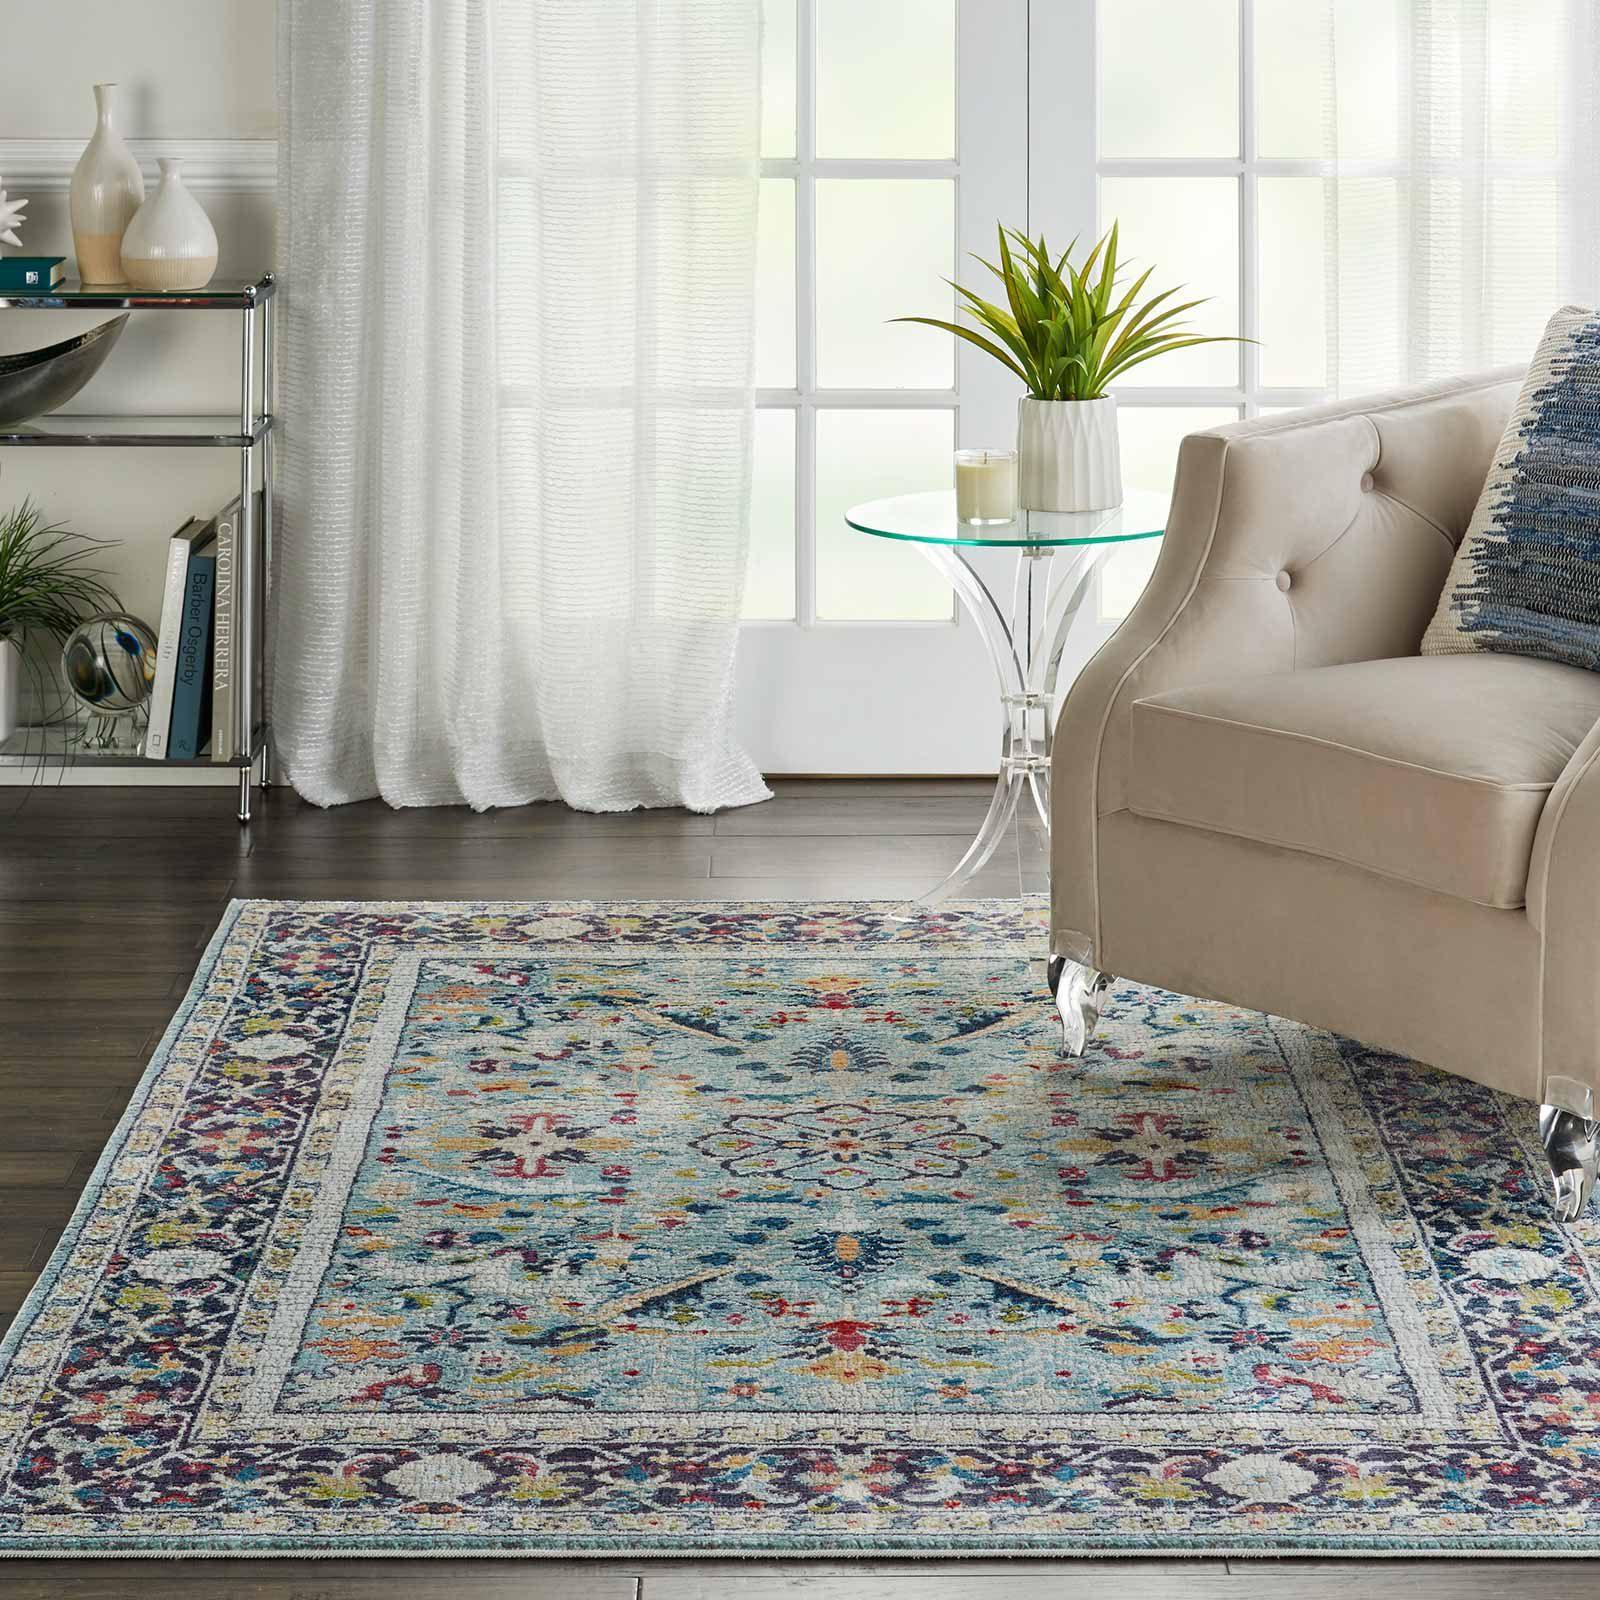 Nourison rug Ankara Global ANR14 TEAL MULTI 5X8 099446498441 interior 1 C